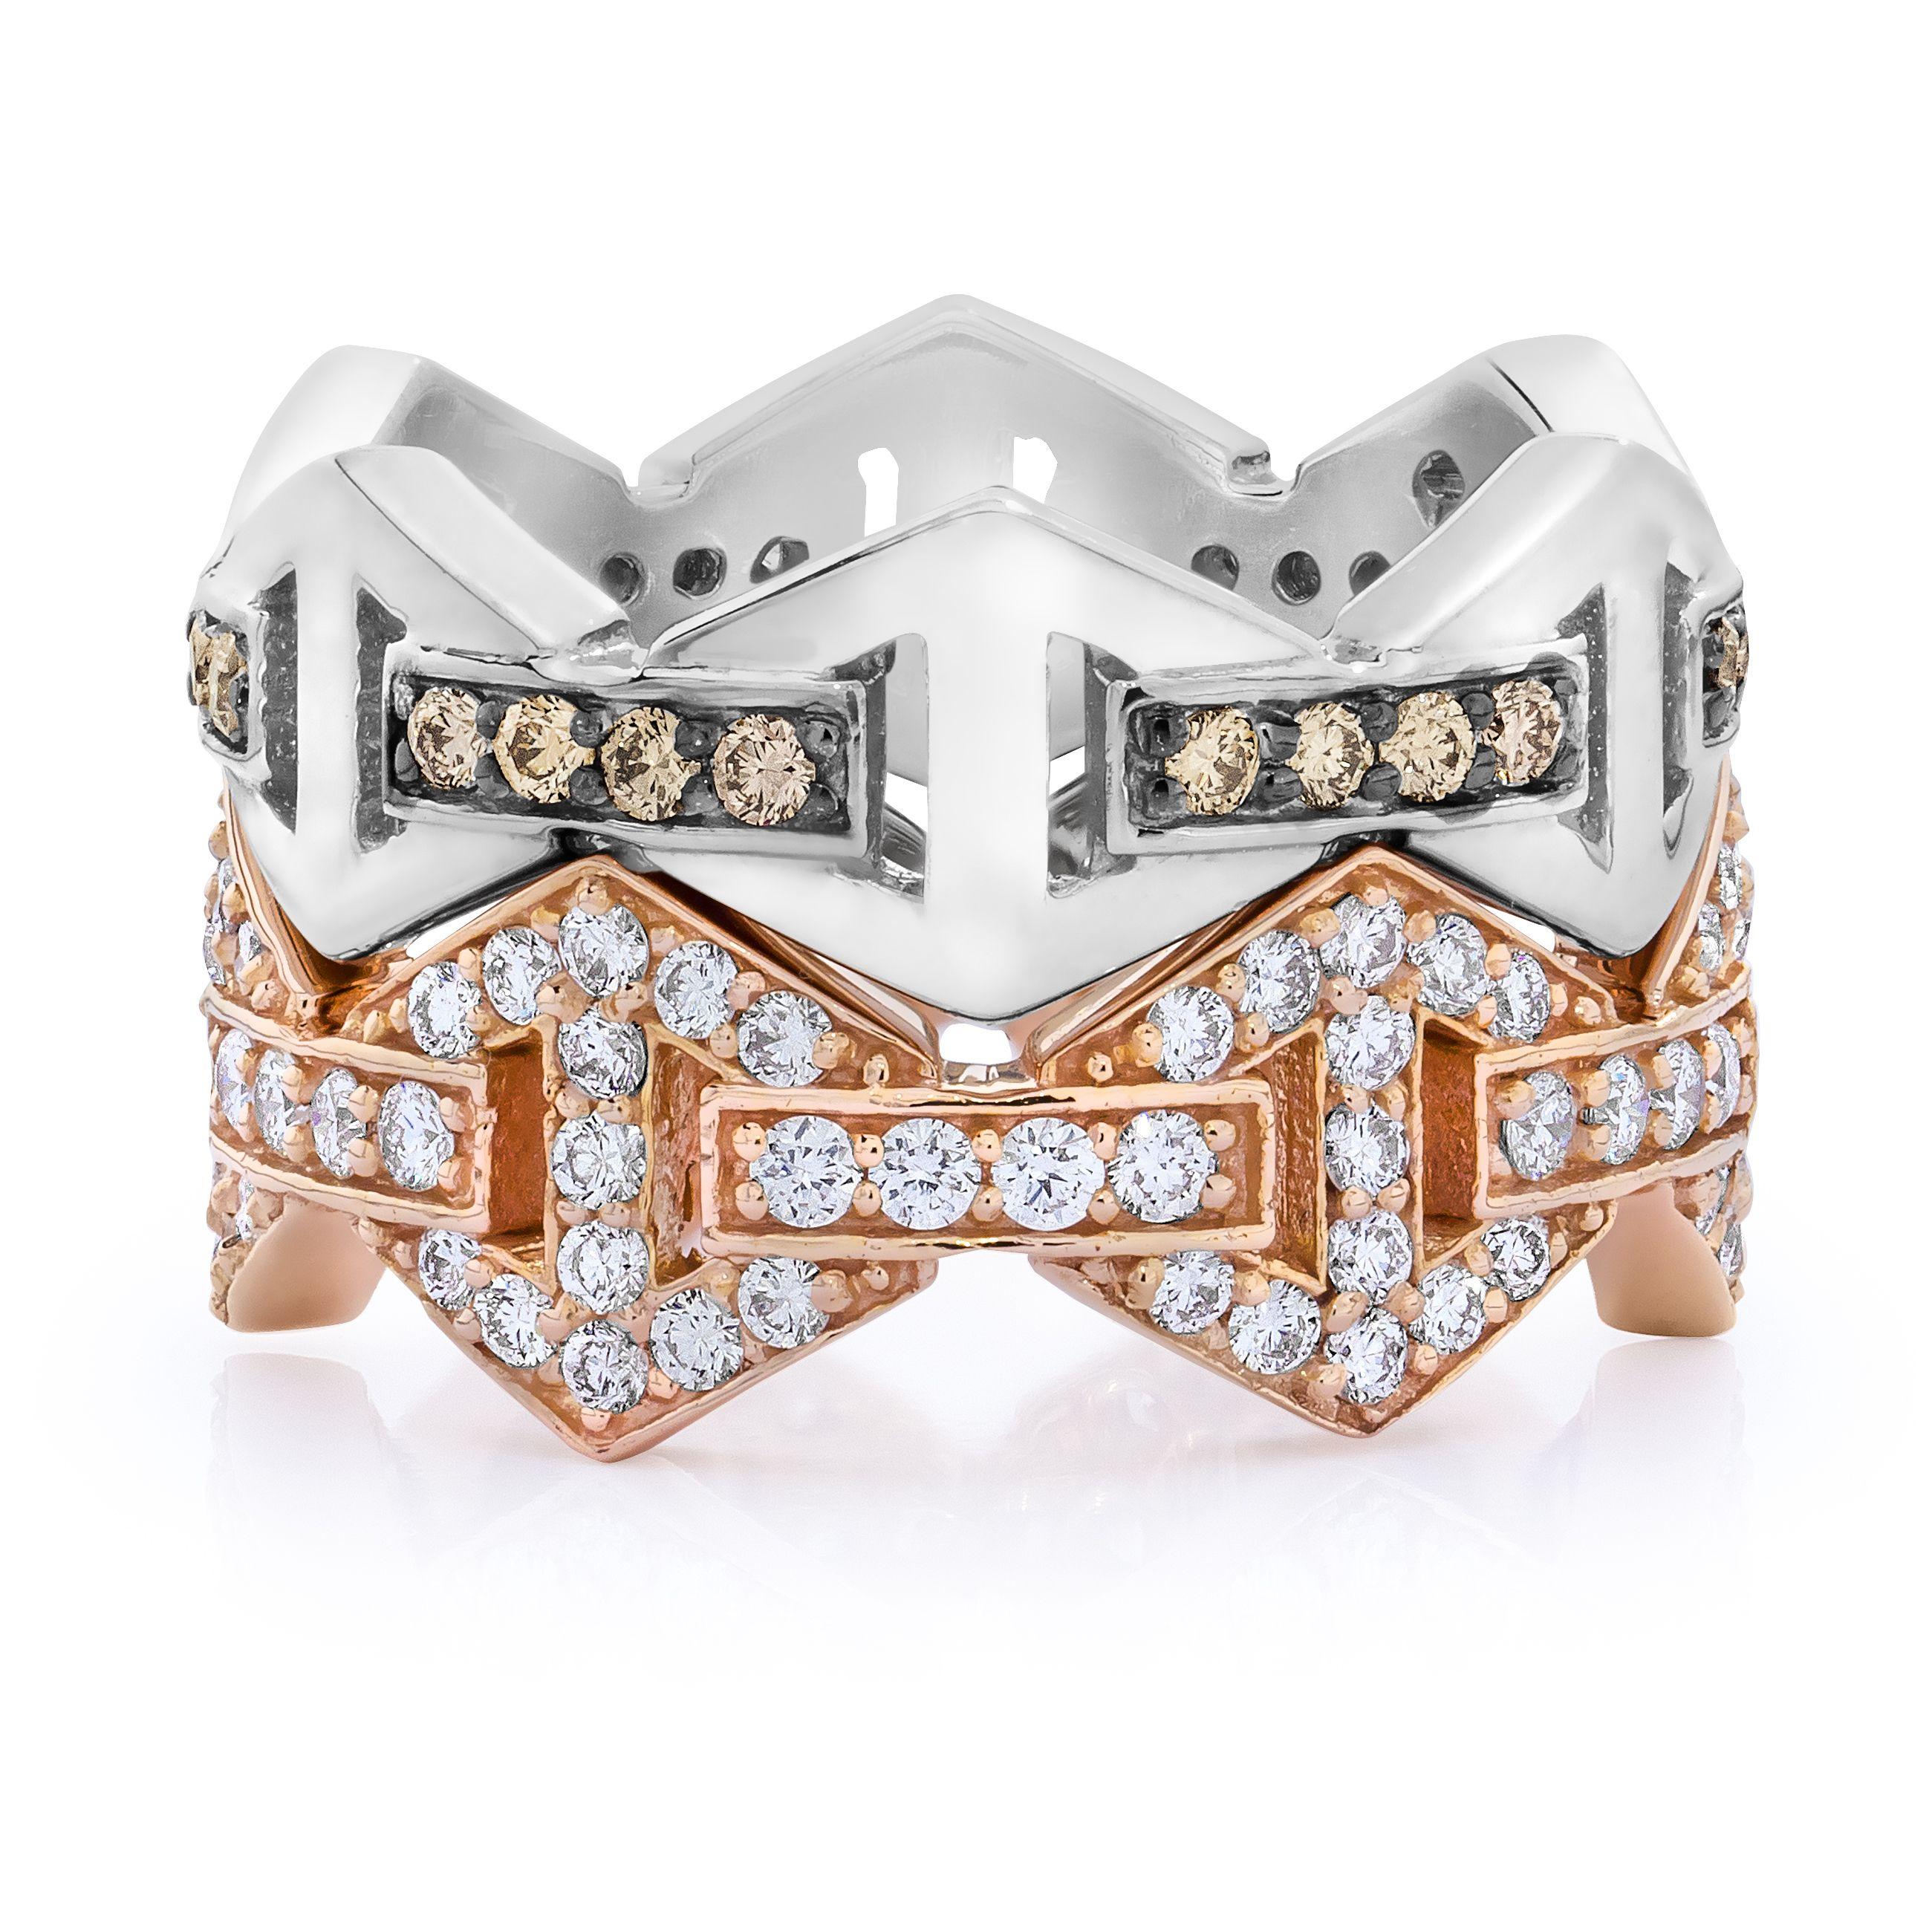 Walters Faith Keynes 18K Signature All Diamond Hexagon Stackable Ring Silver oUwVN